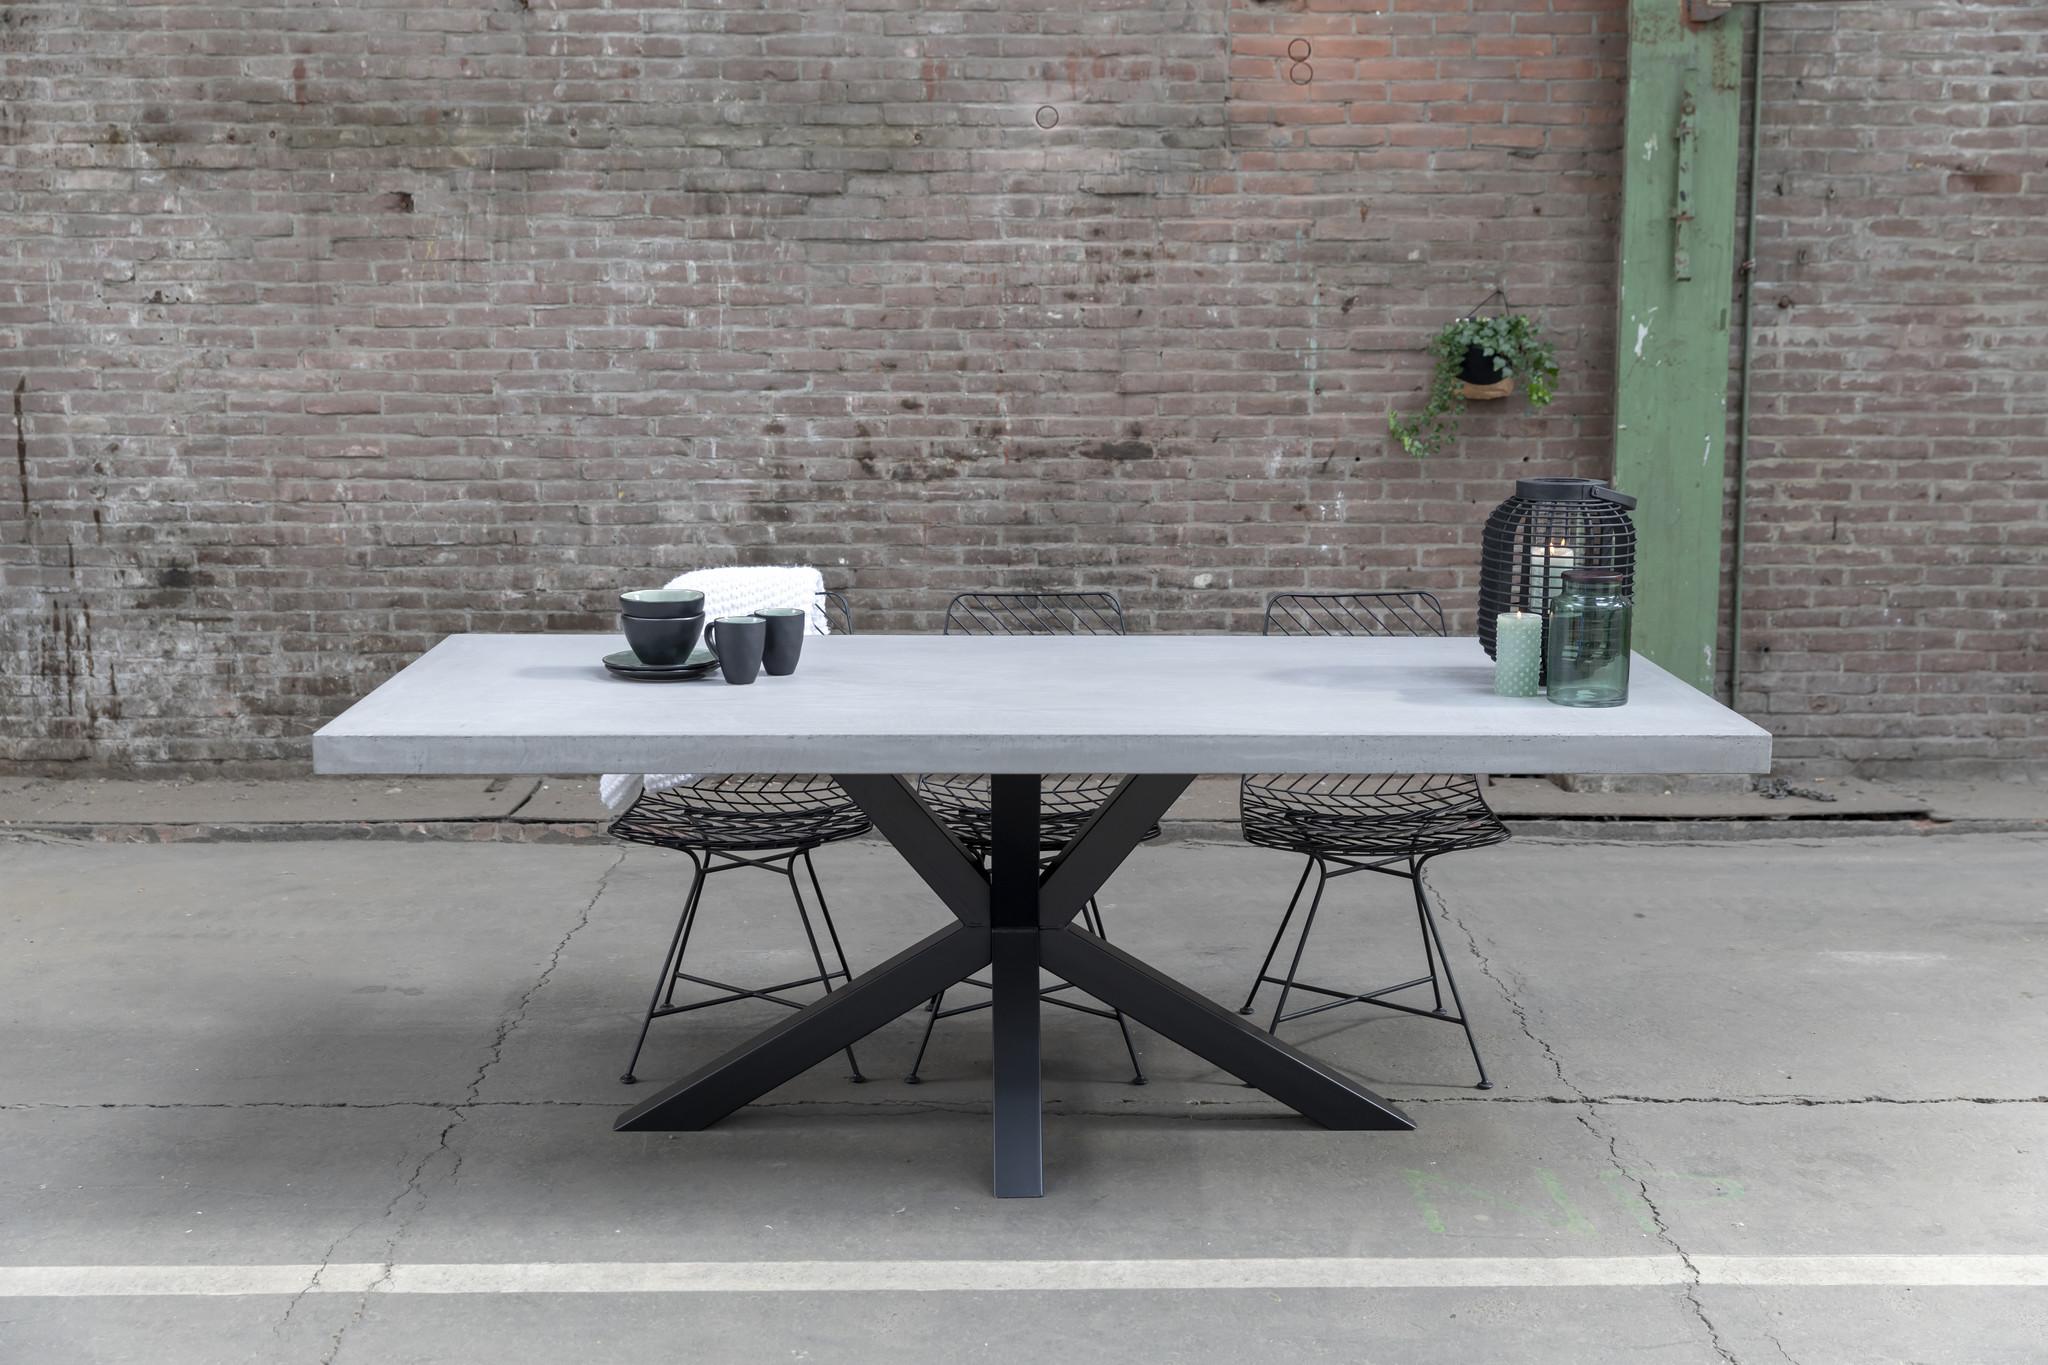 matrix-tafelpoot-sfeerbeeld-01